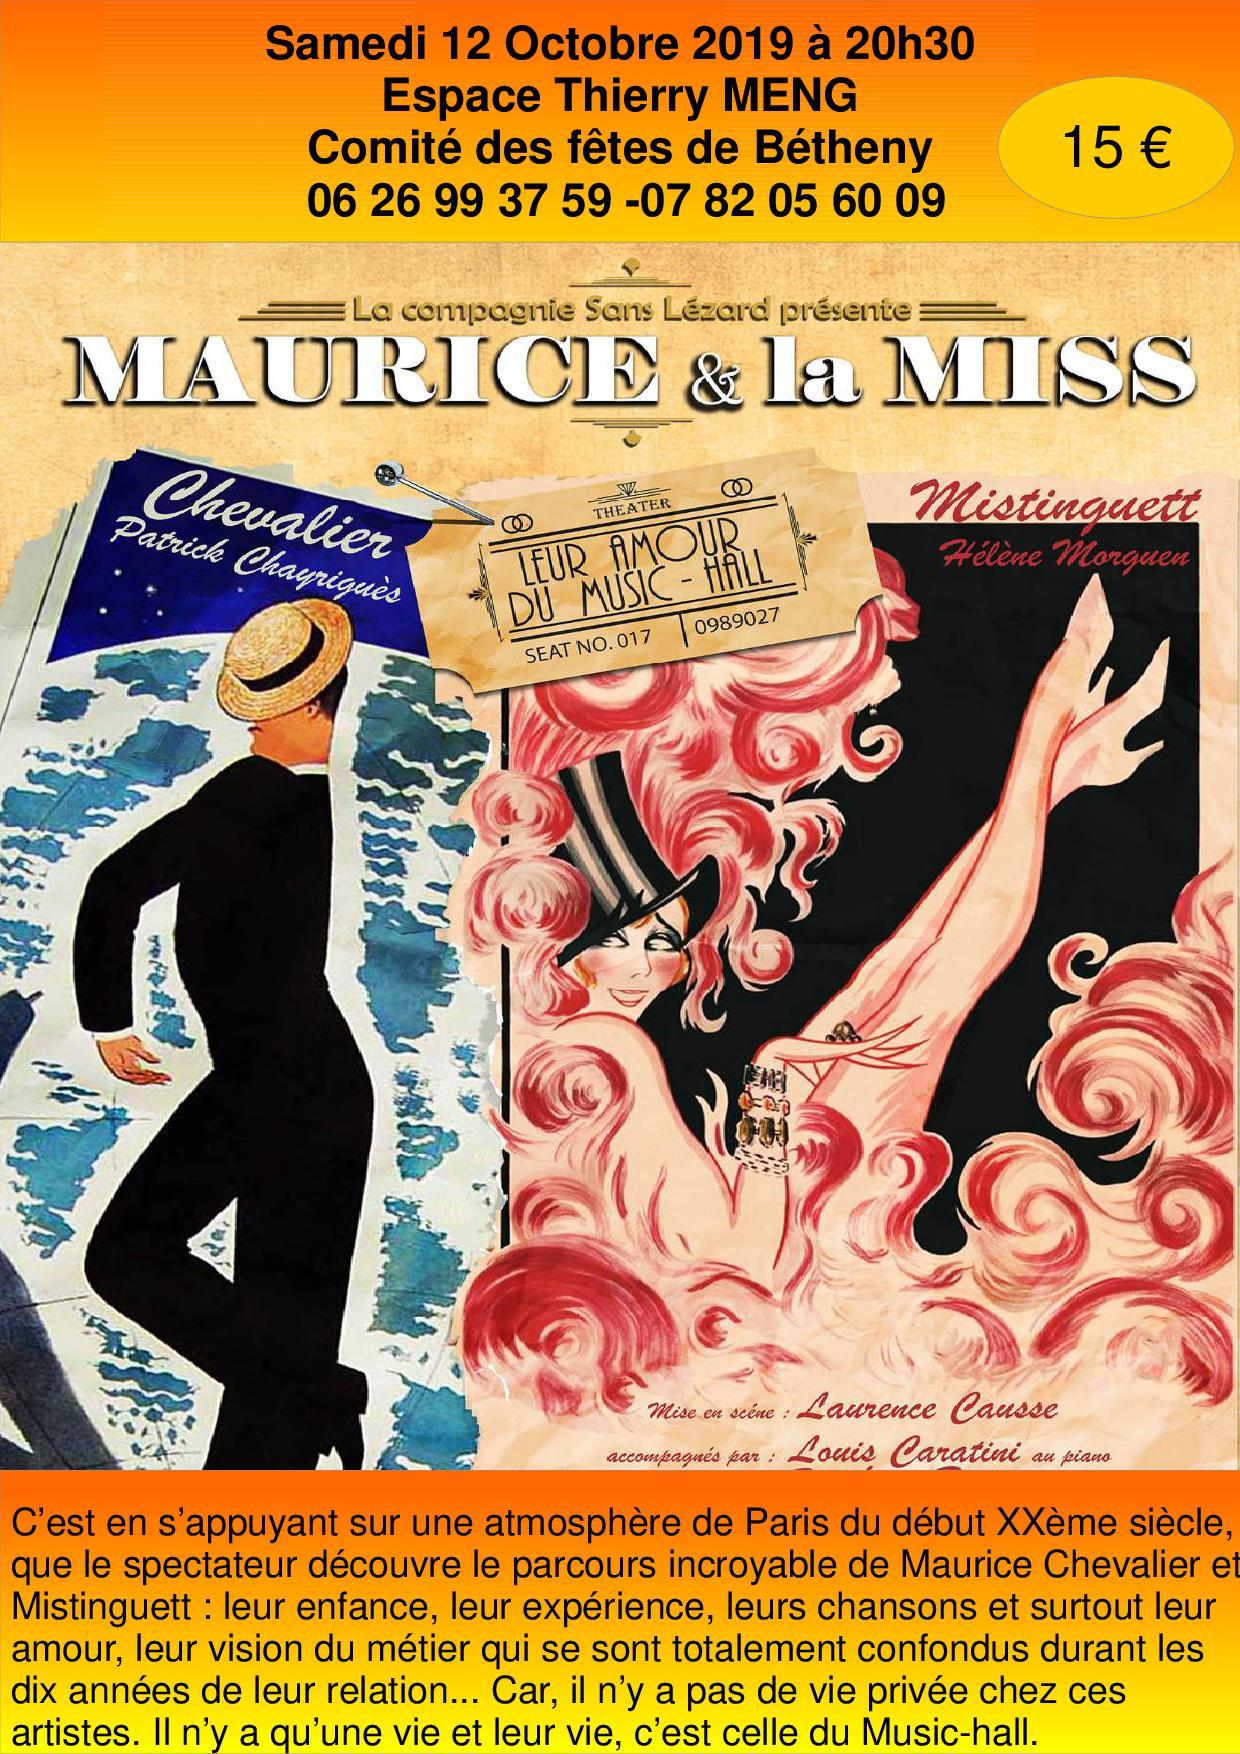 12 OCT 2019 Maurice&la MISS  (15)